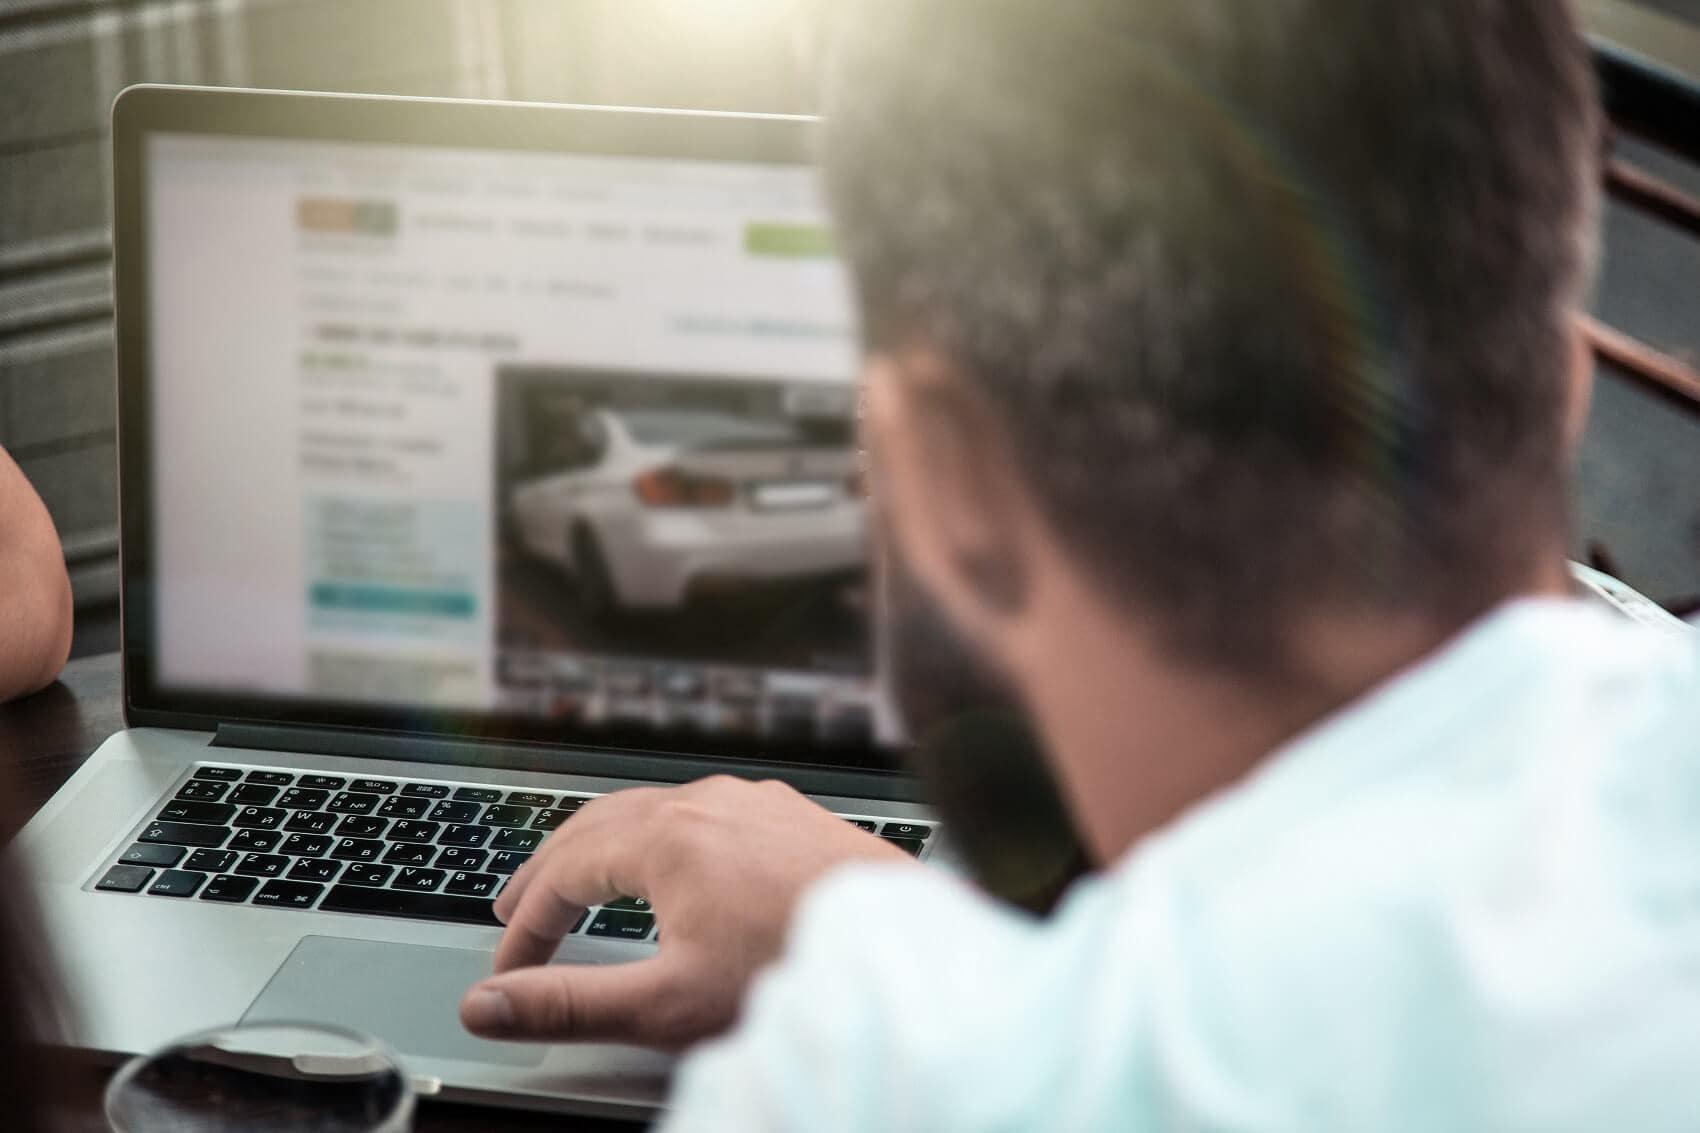 Get trade-in value online